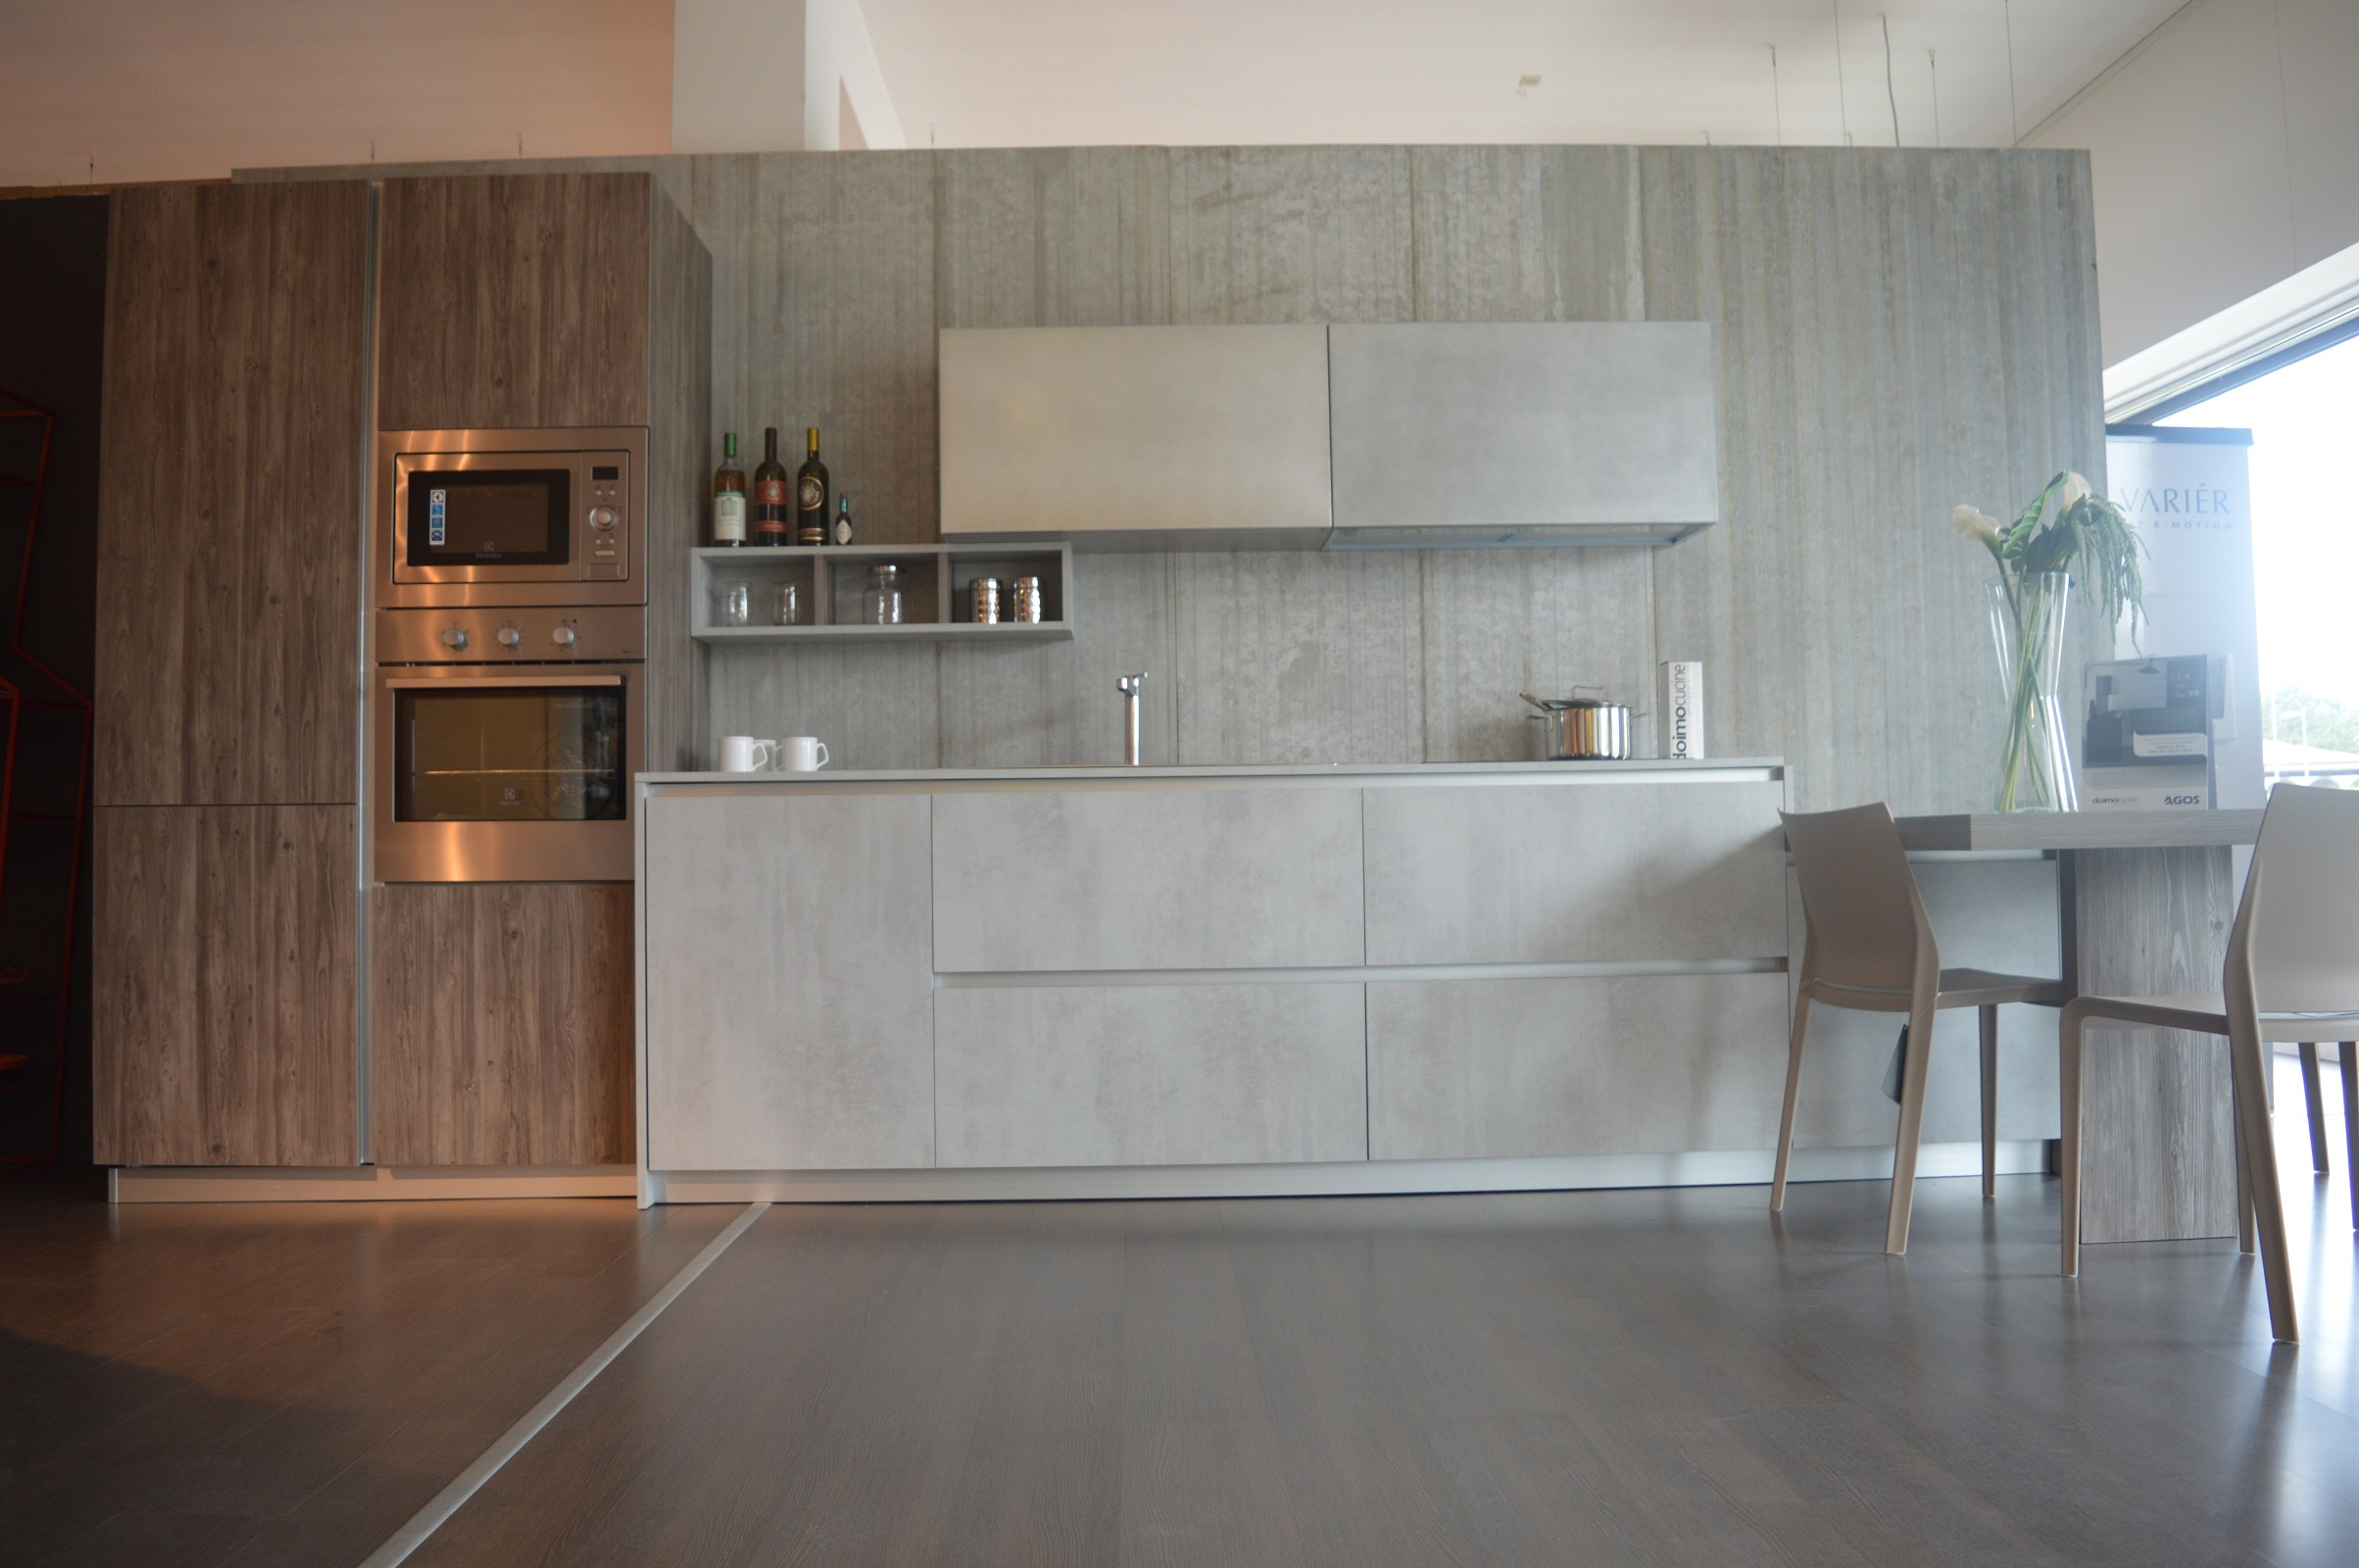 Beautiful Doimo Cucine Prezzi Gallery - Design and Ideas ...